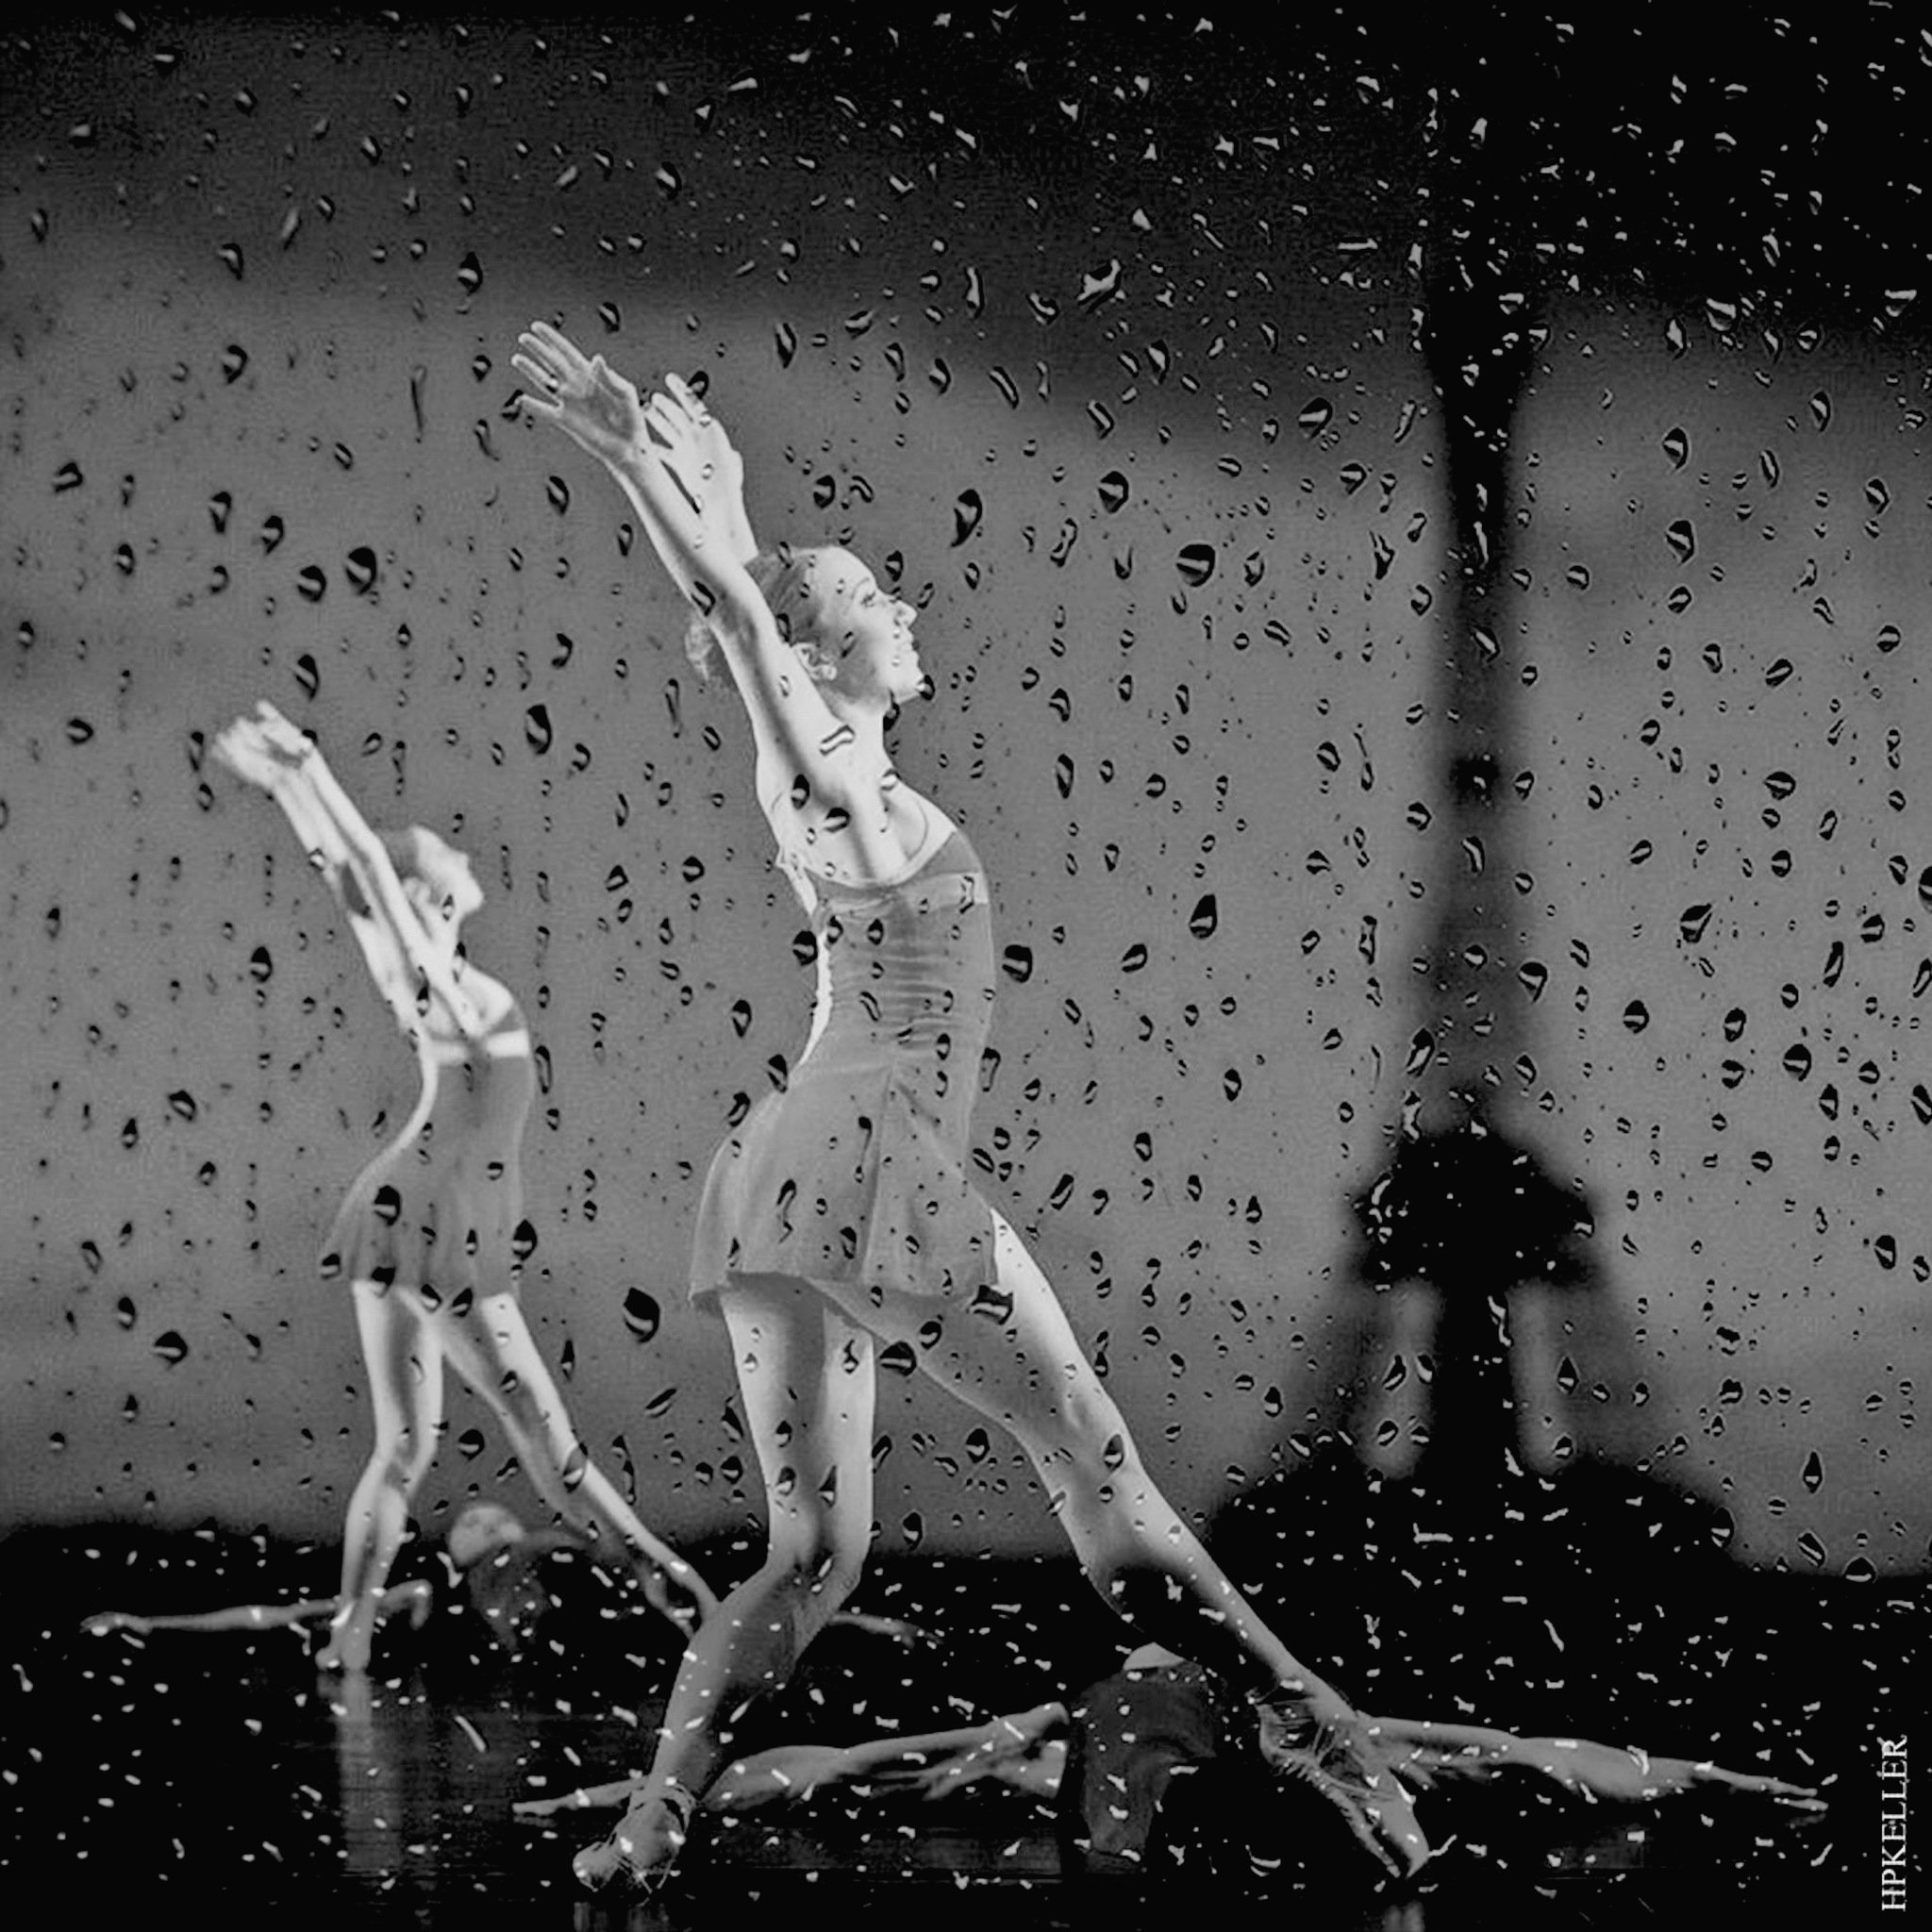 Walking in the rain II,  Analogscan - Kombigrafie by Hans-Peter Keller